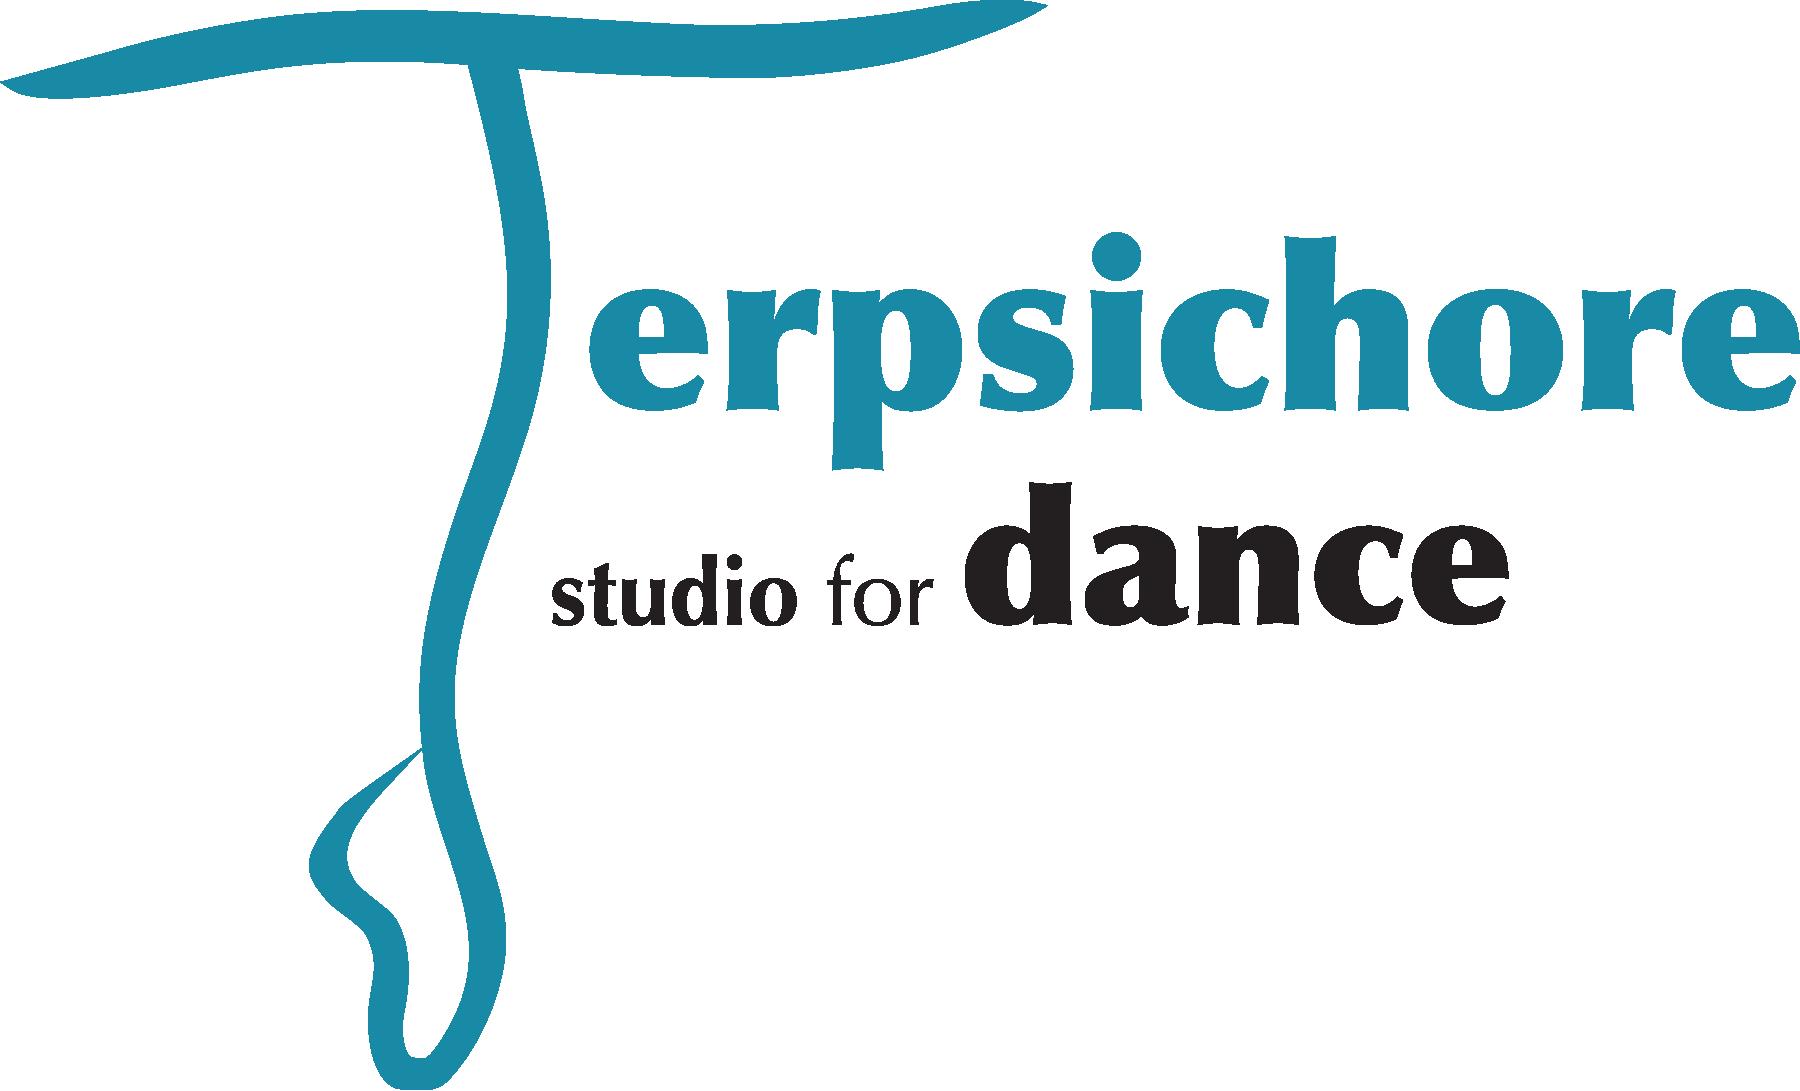 Terpsichore Studio for Dance